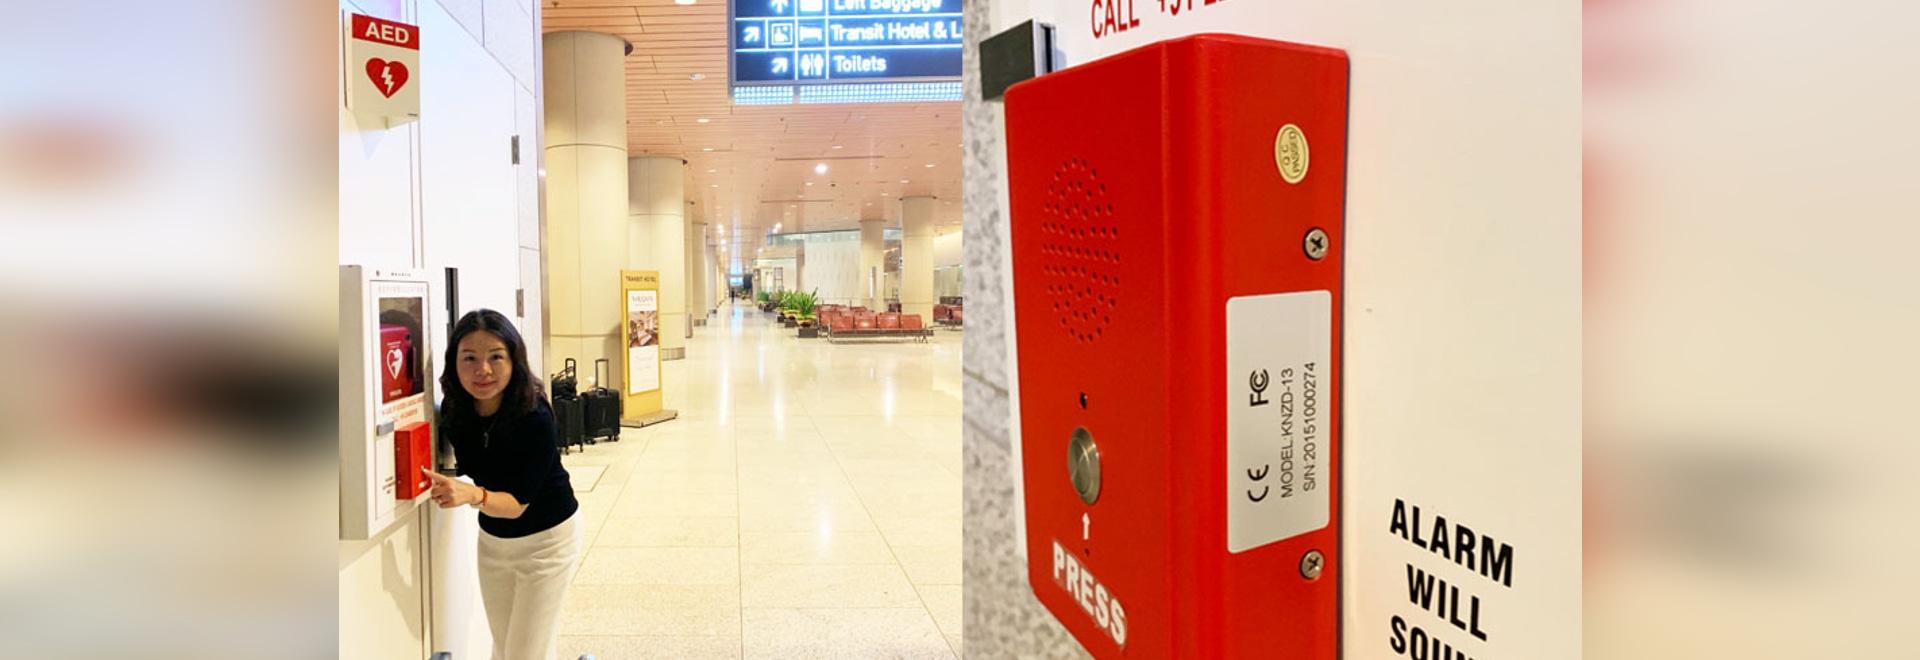 KNTECH Emergency Intercom System for Mumbai Airport